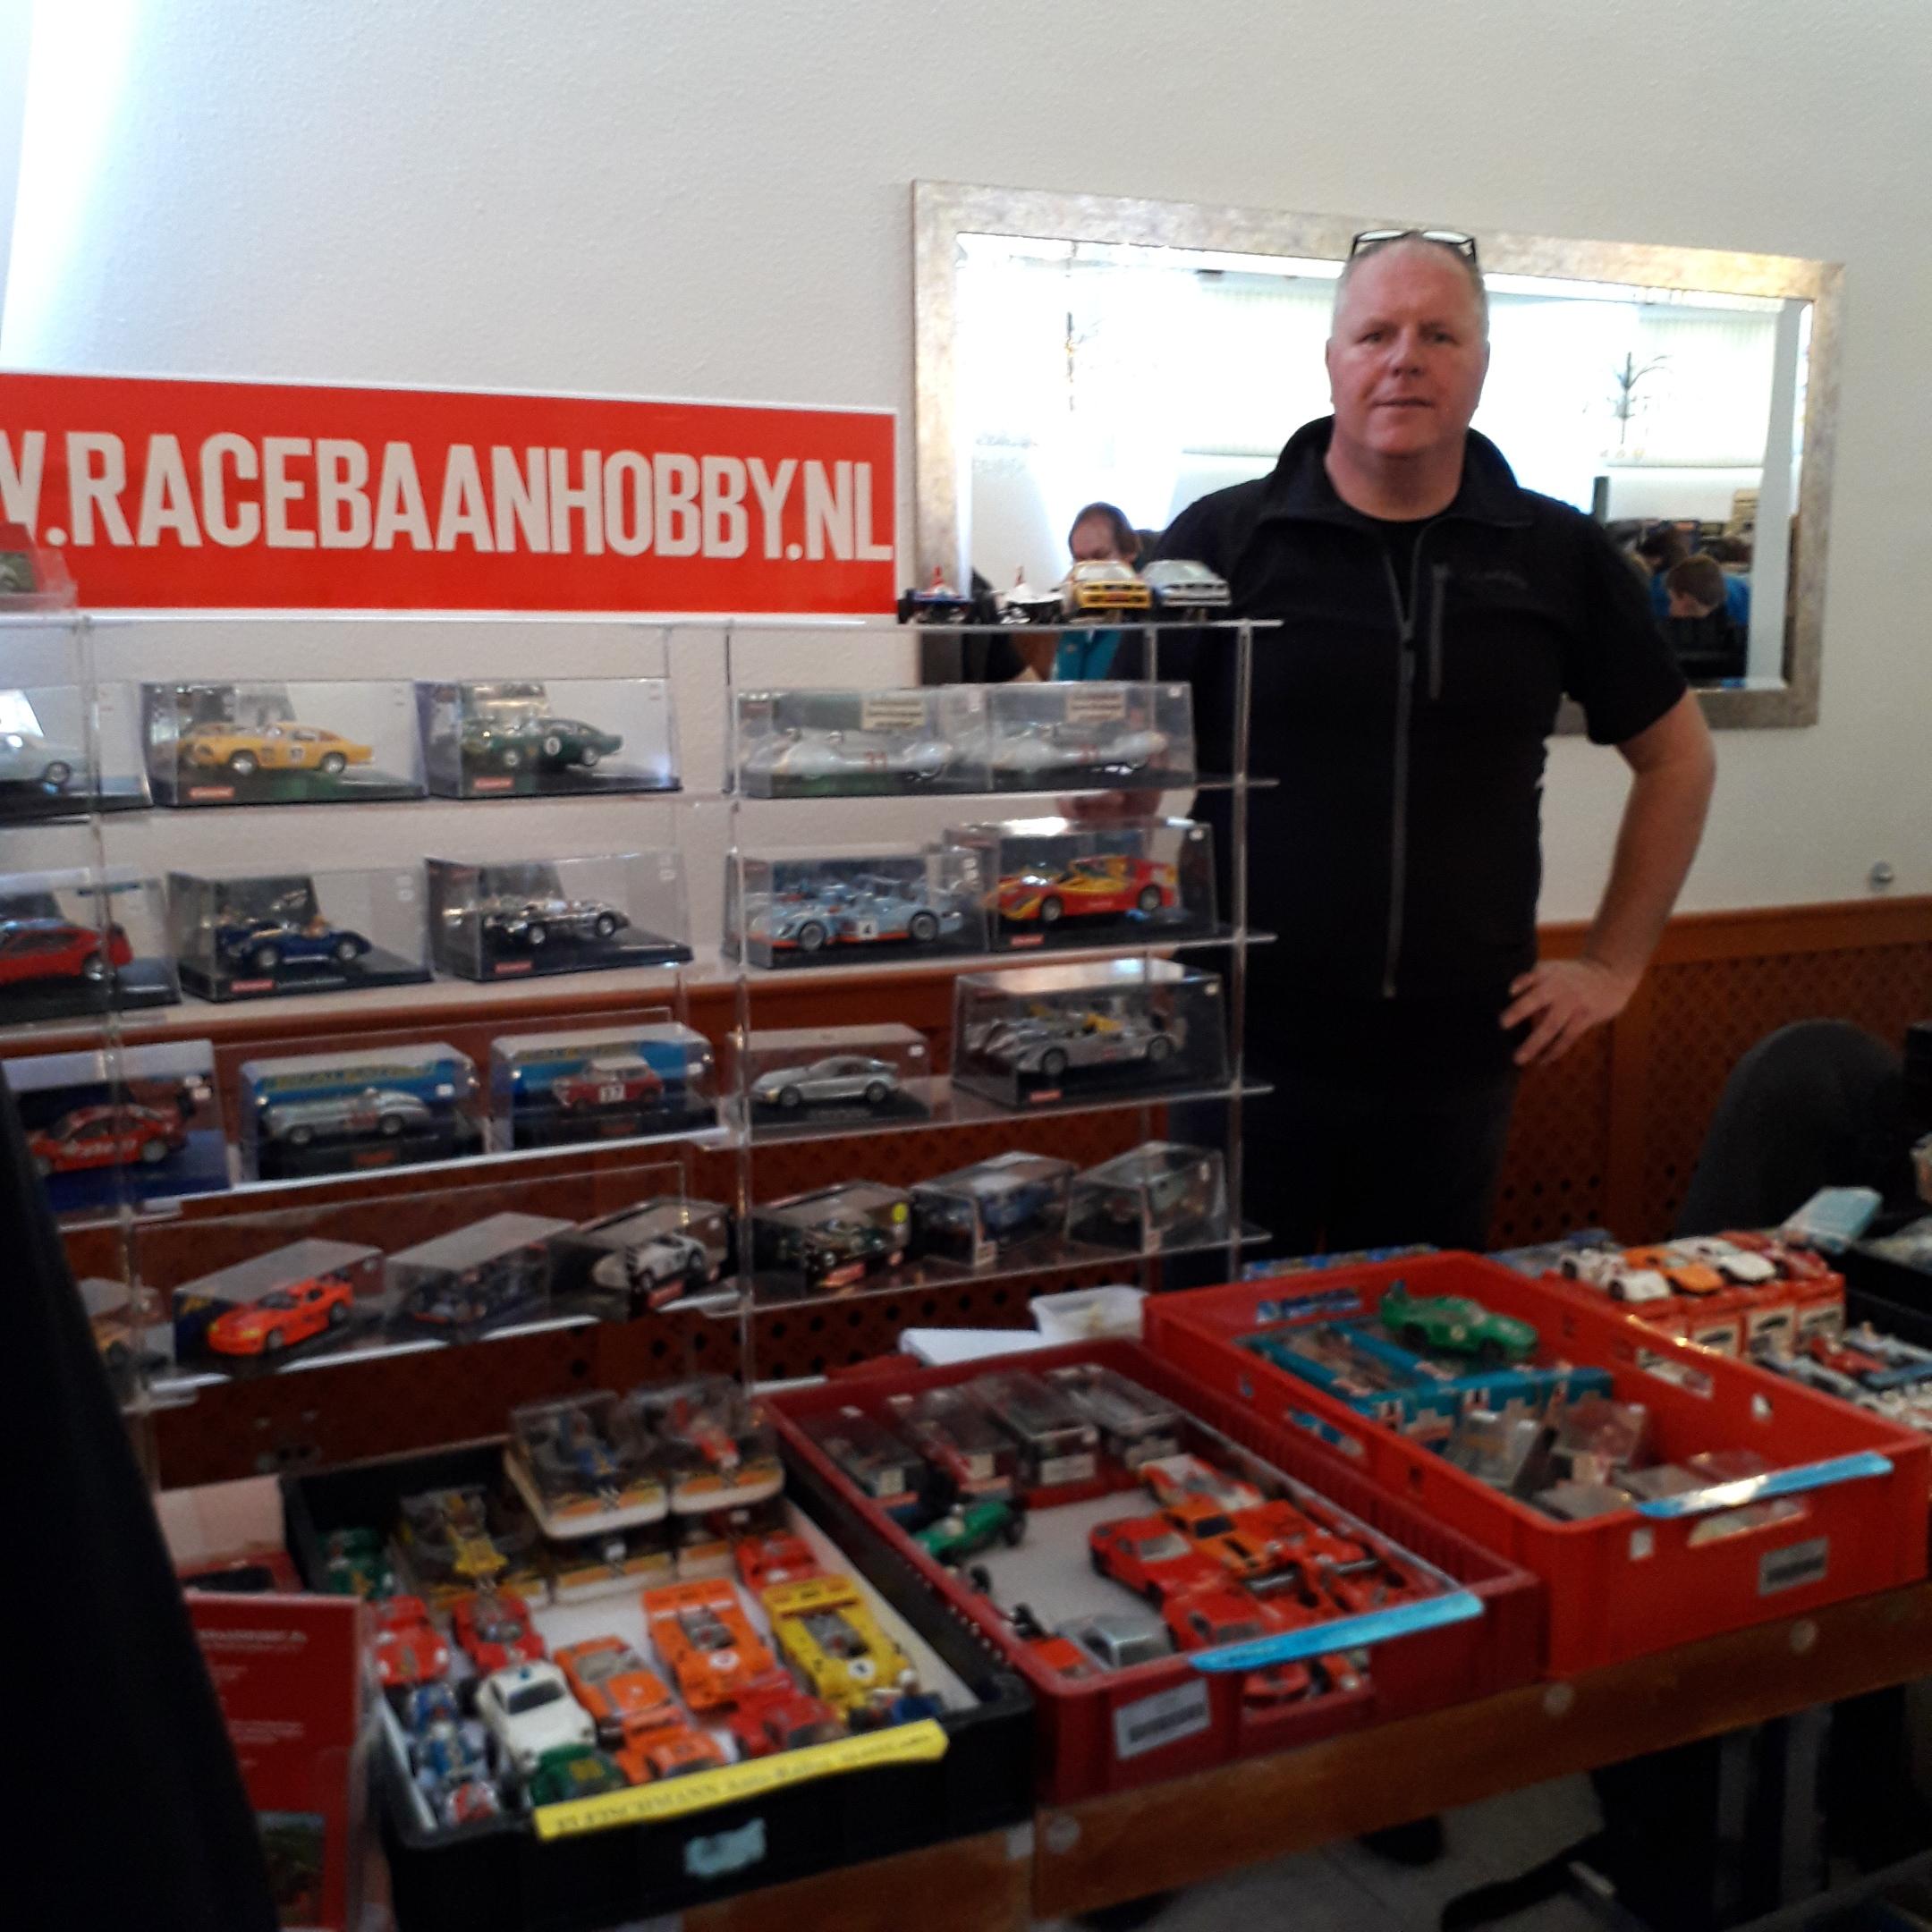 racebaanhobby